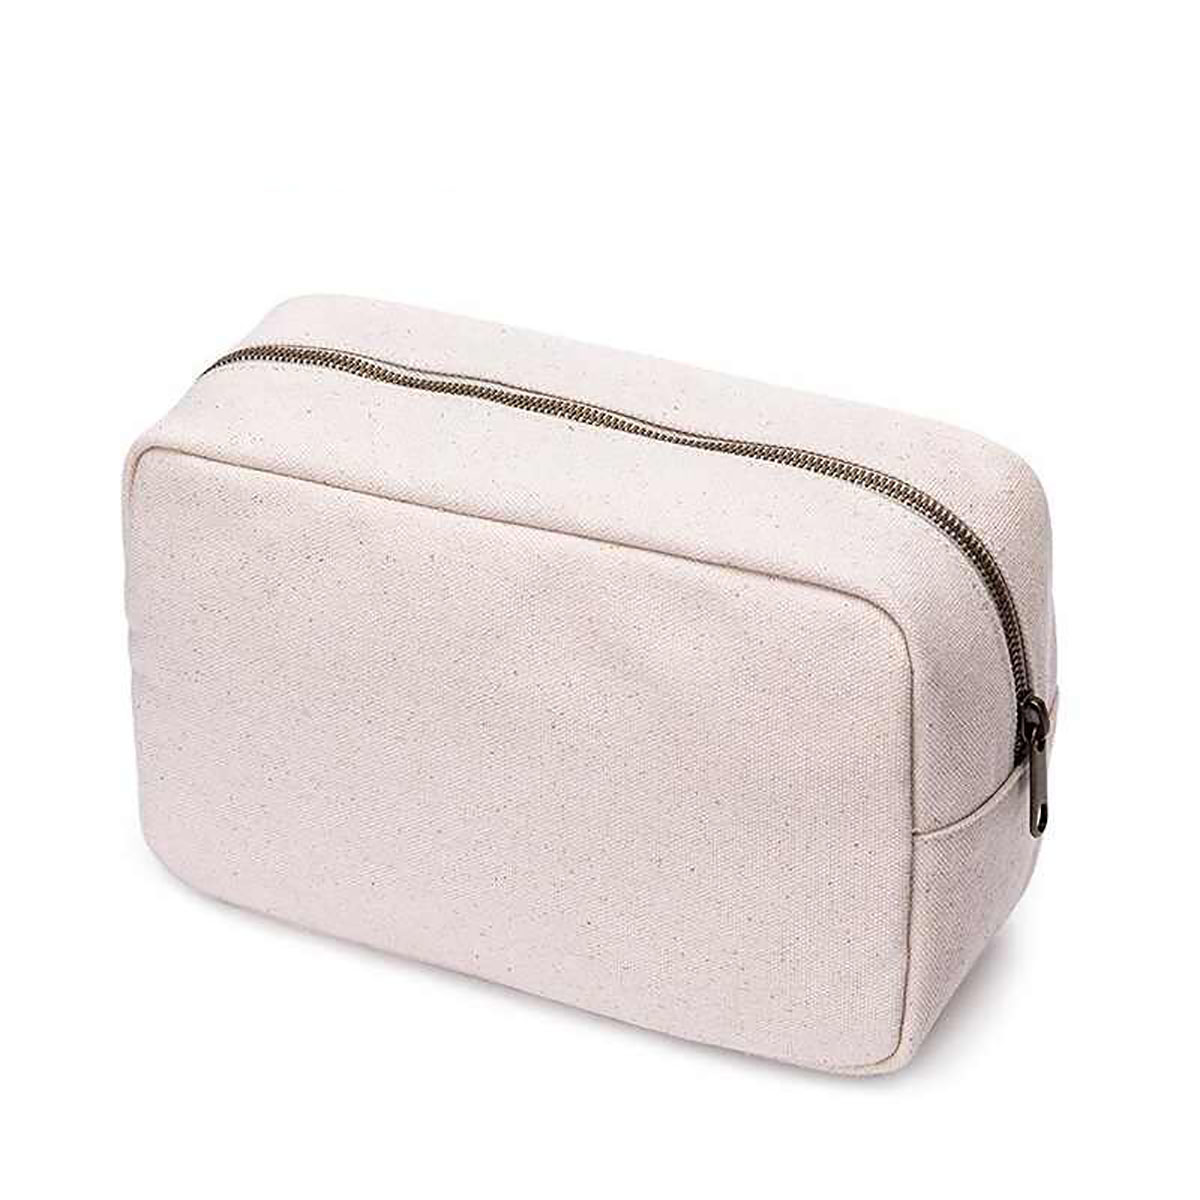 Durable 12 Oz Cotton Canvas Cosmetic Bag